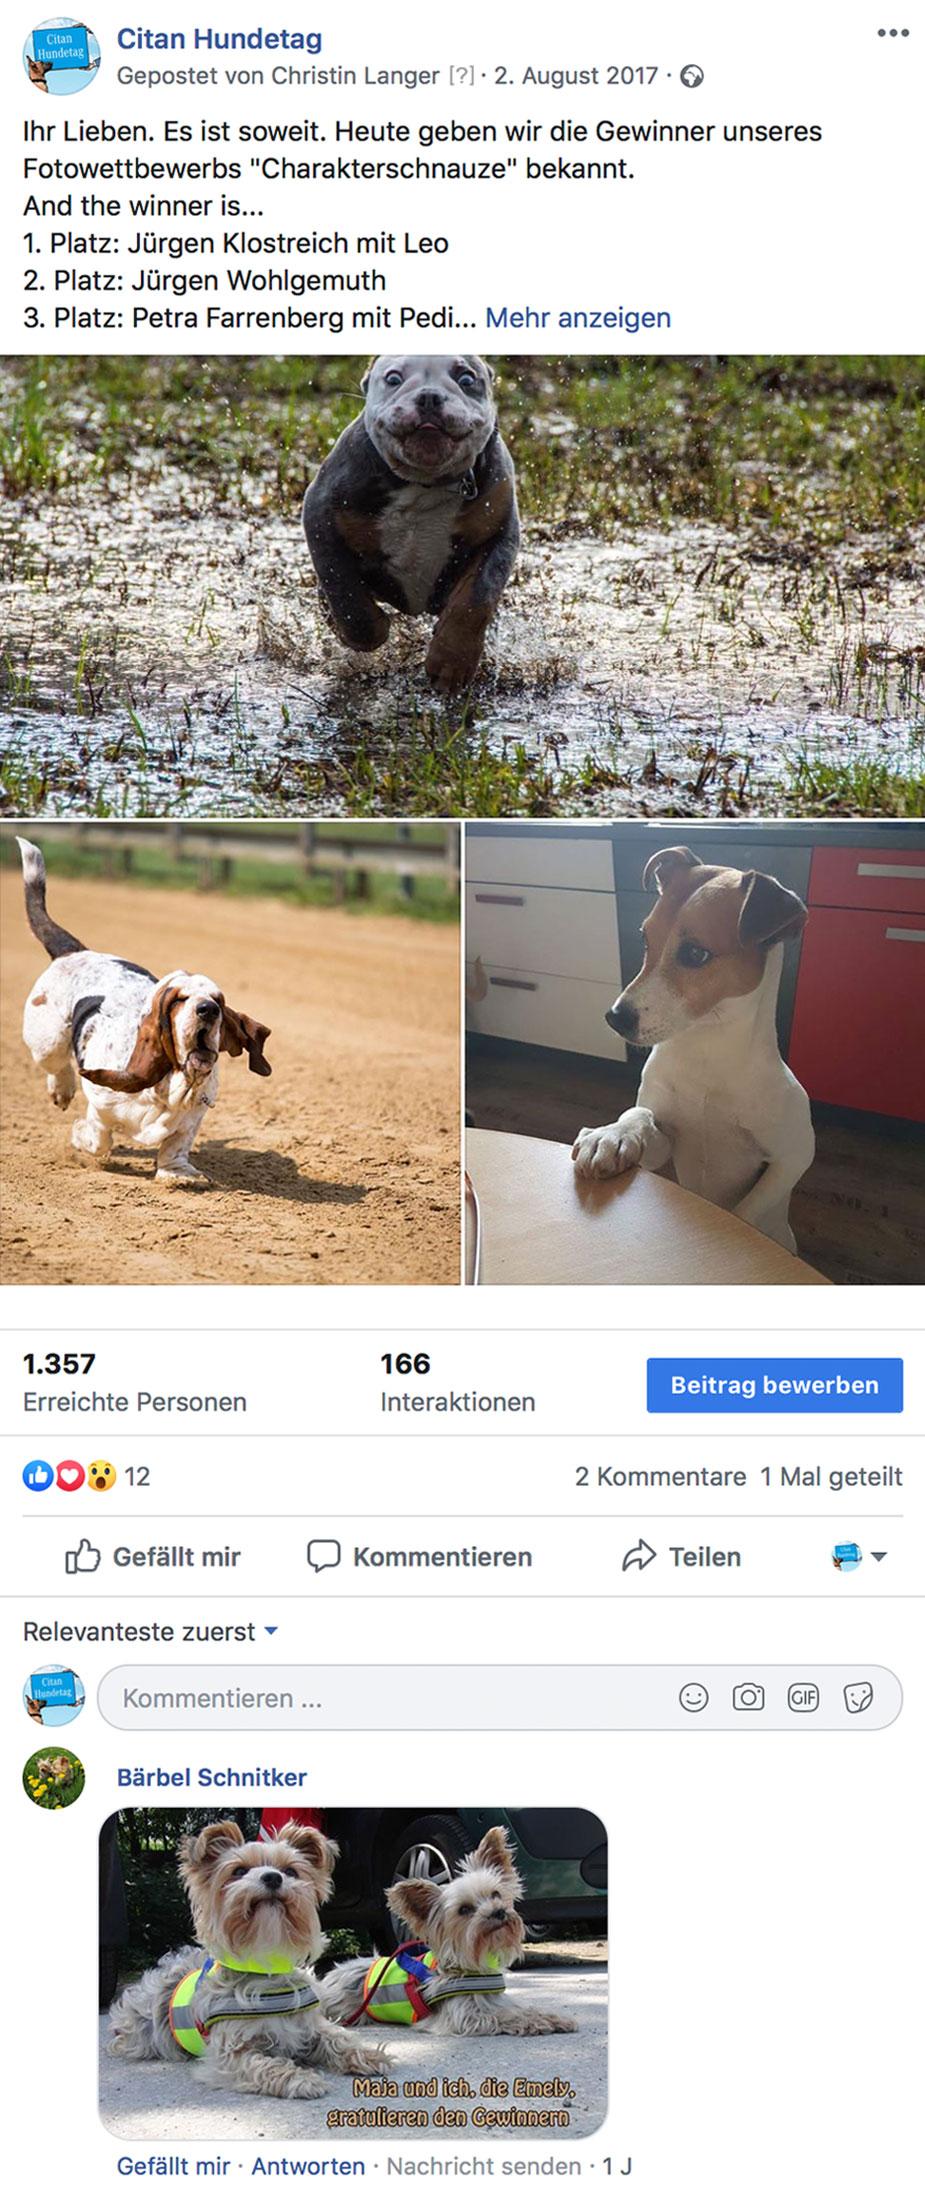 Citan Hundetag Facebook